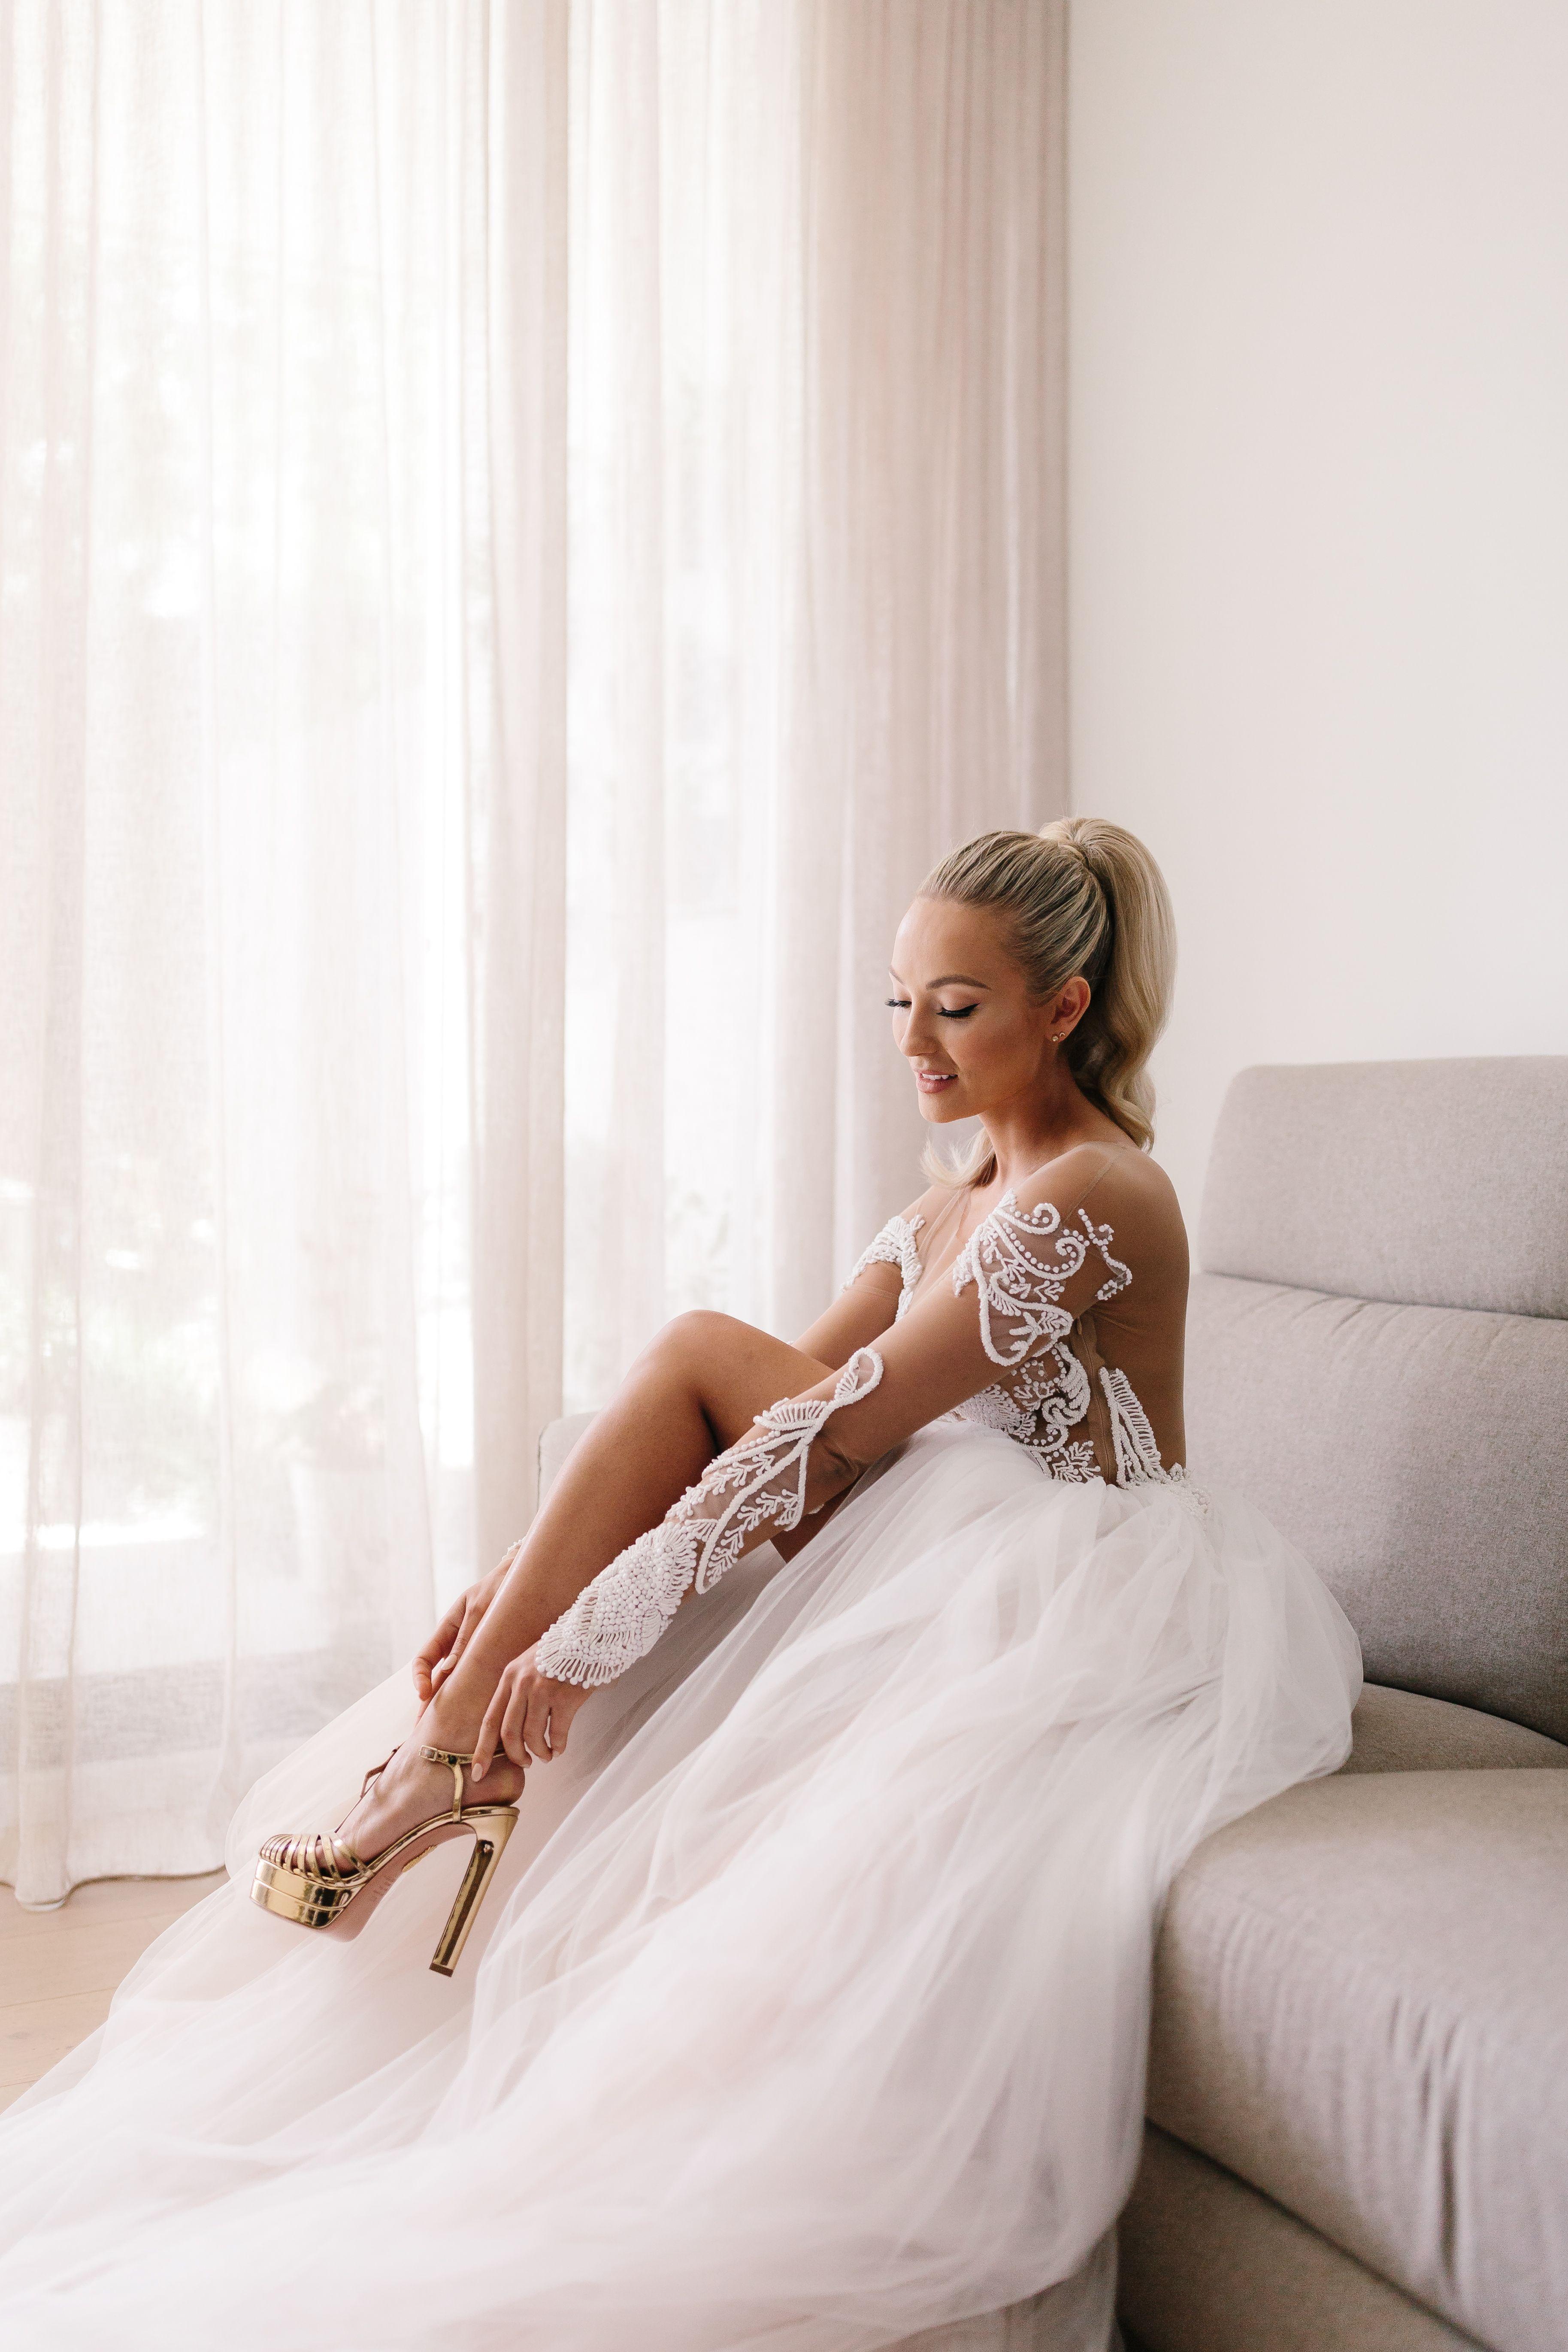 Pin by Павел on Свадебный Wedding photography styles